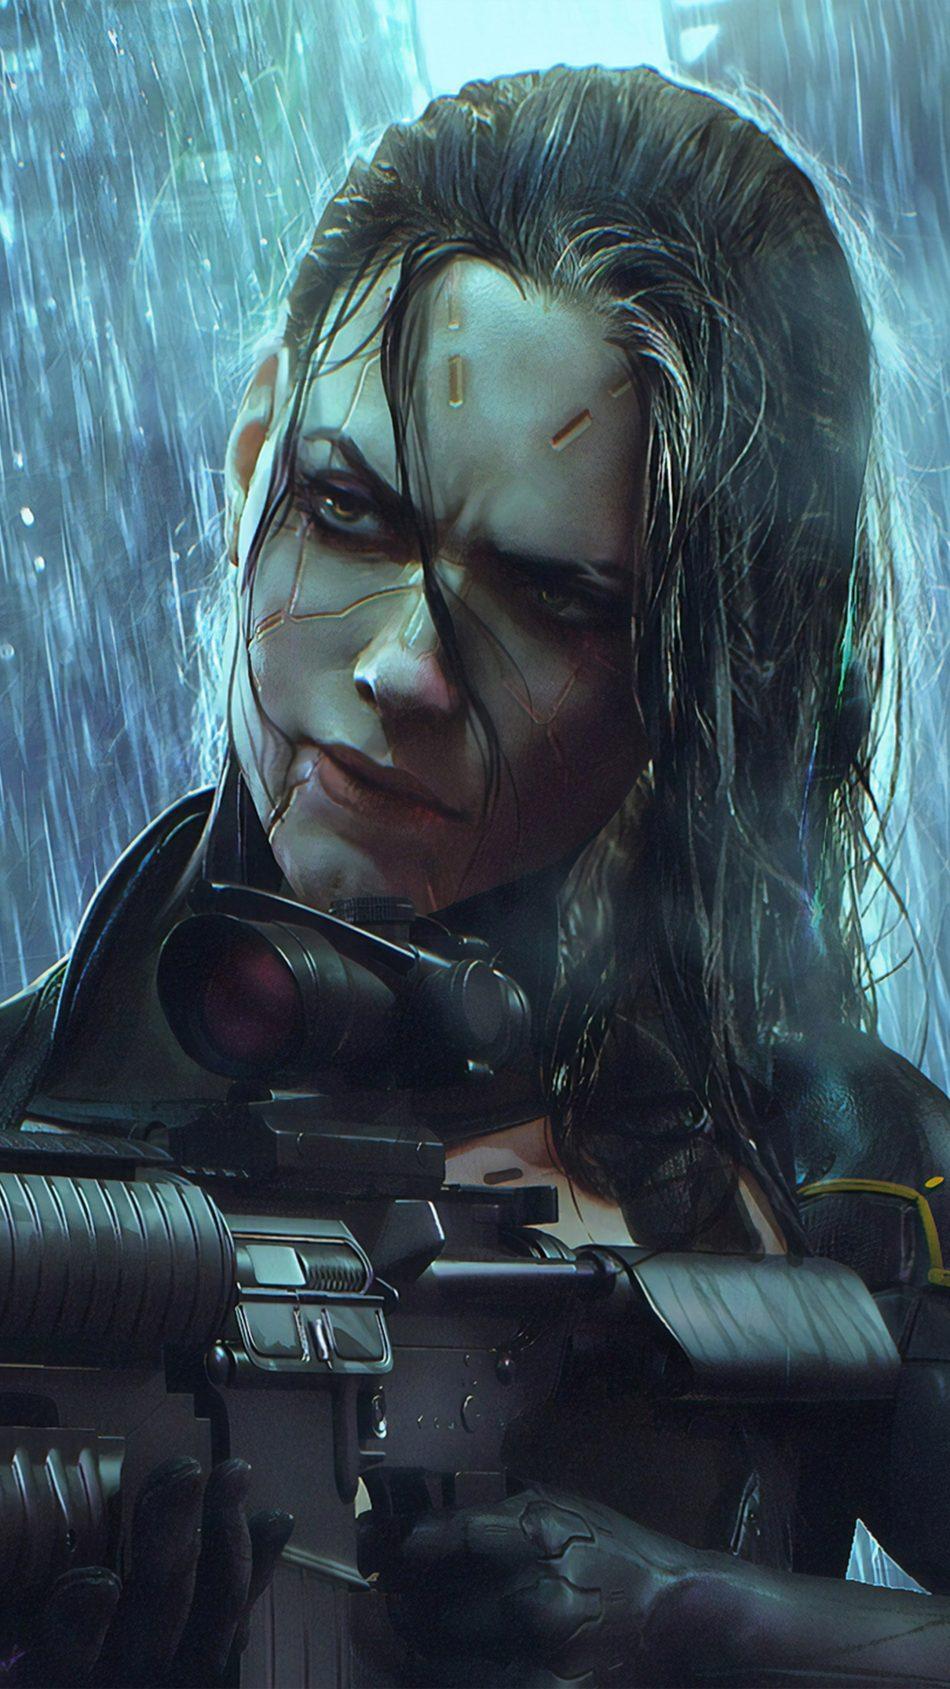 Woman Warrior Cyberpunk 2077 4K Ultra HD Mobile Wallpaper